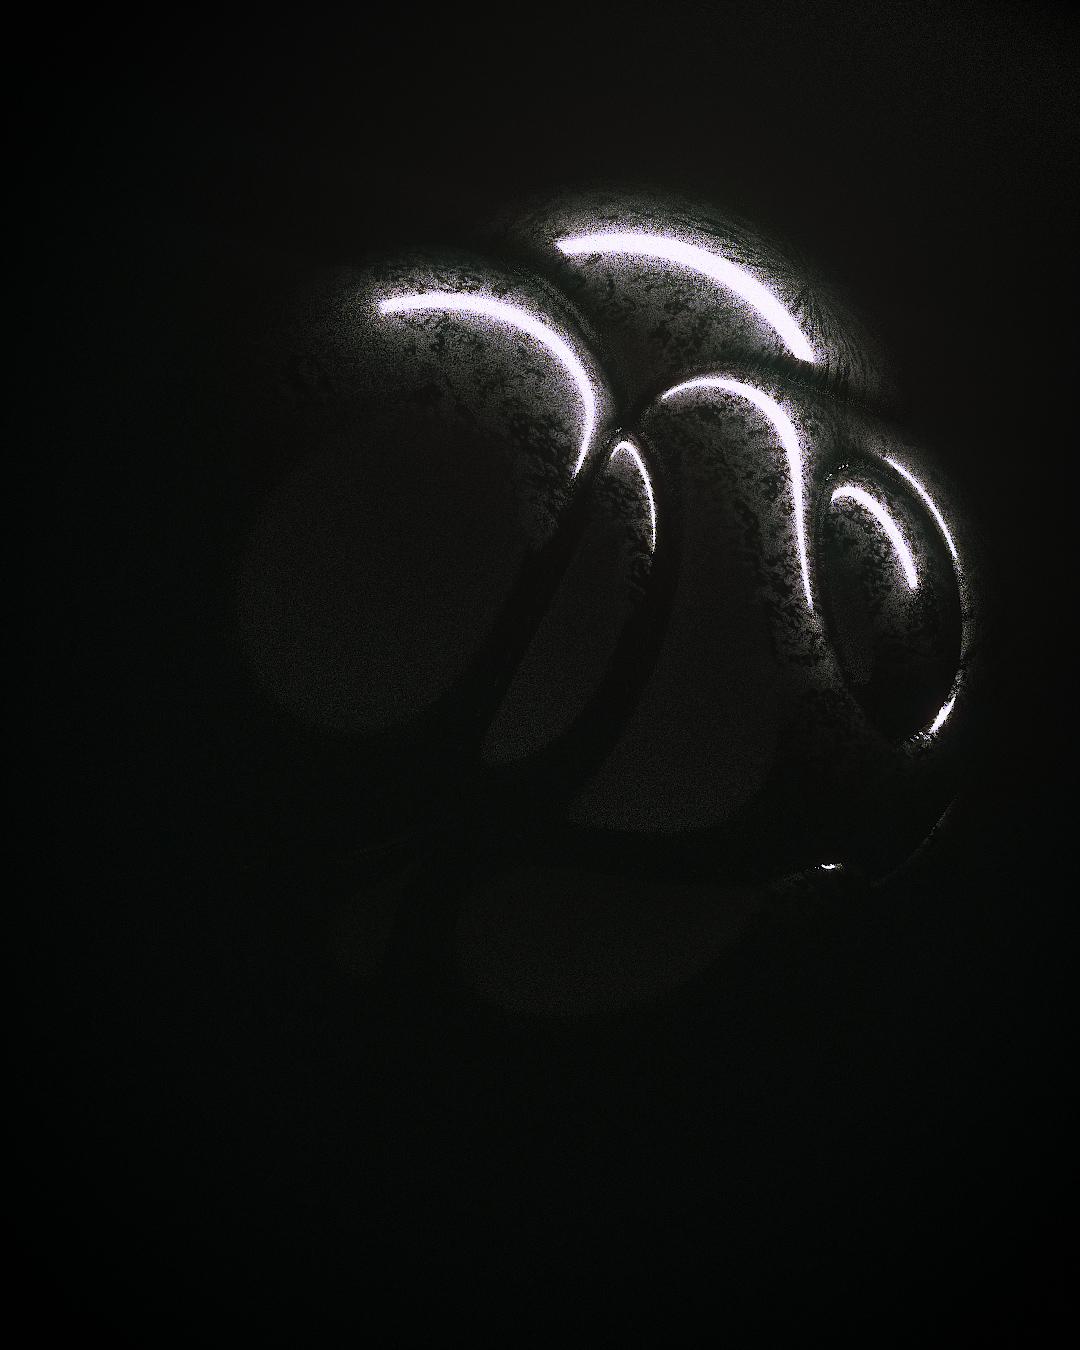 [23-05-17] - Specular.jpg